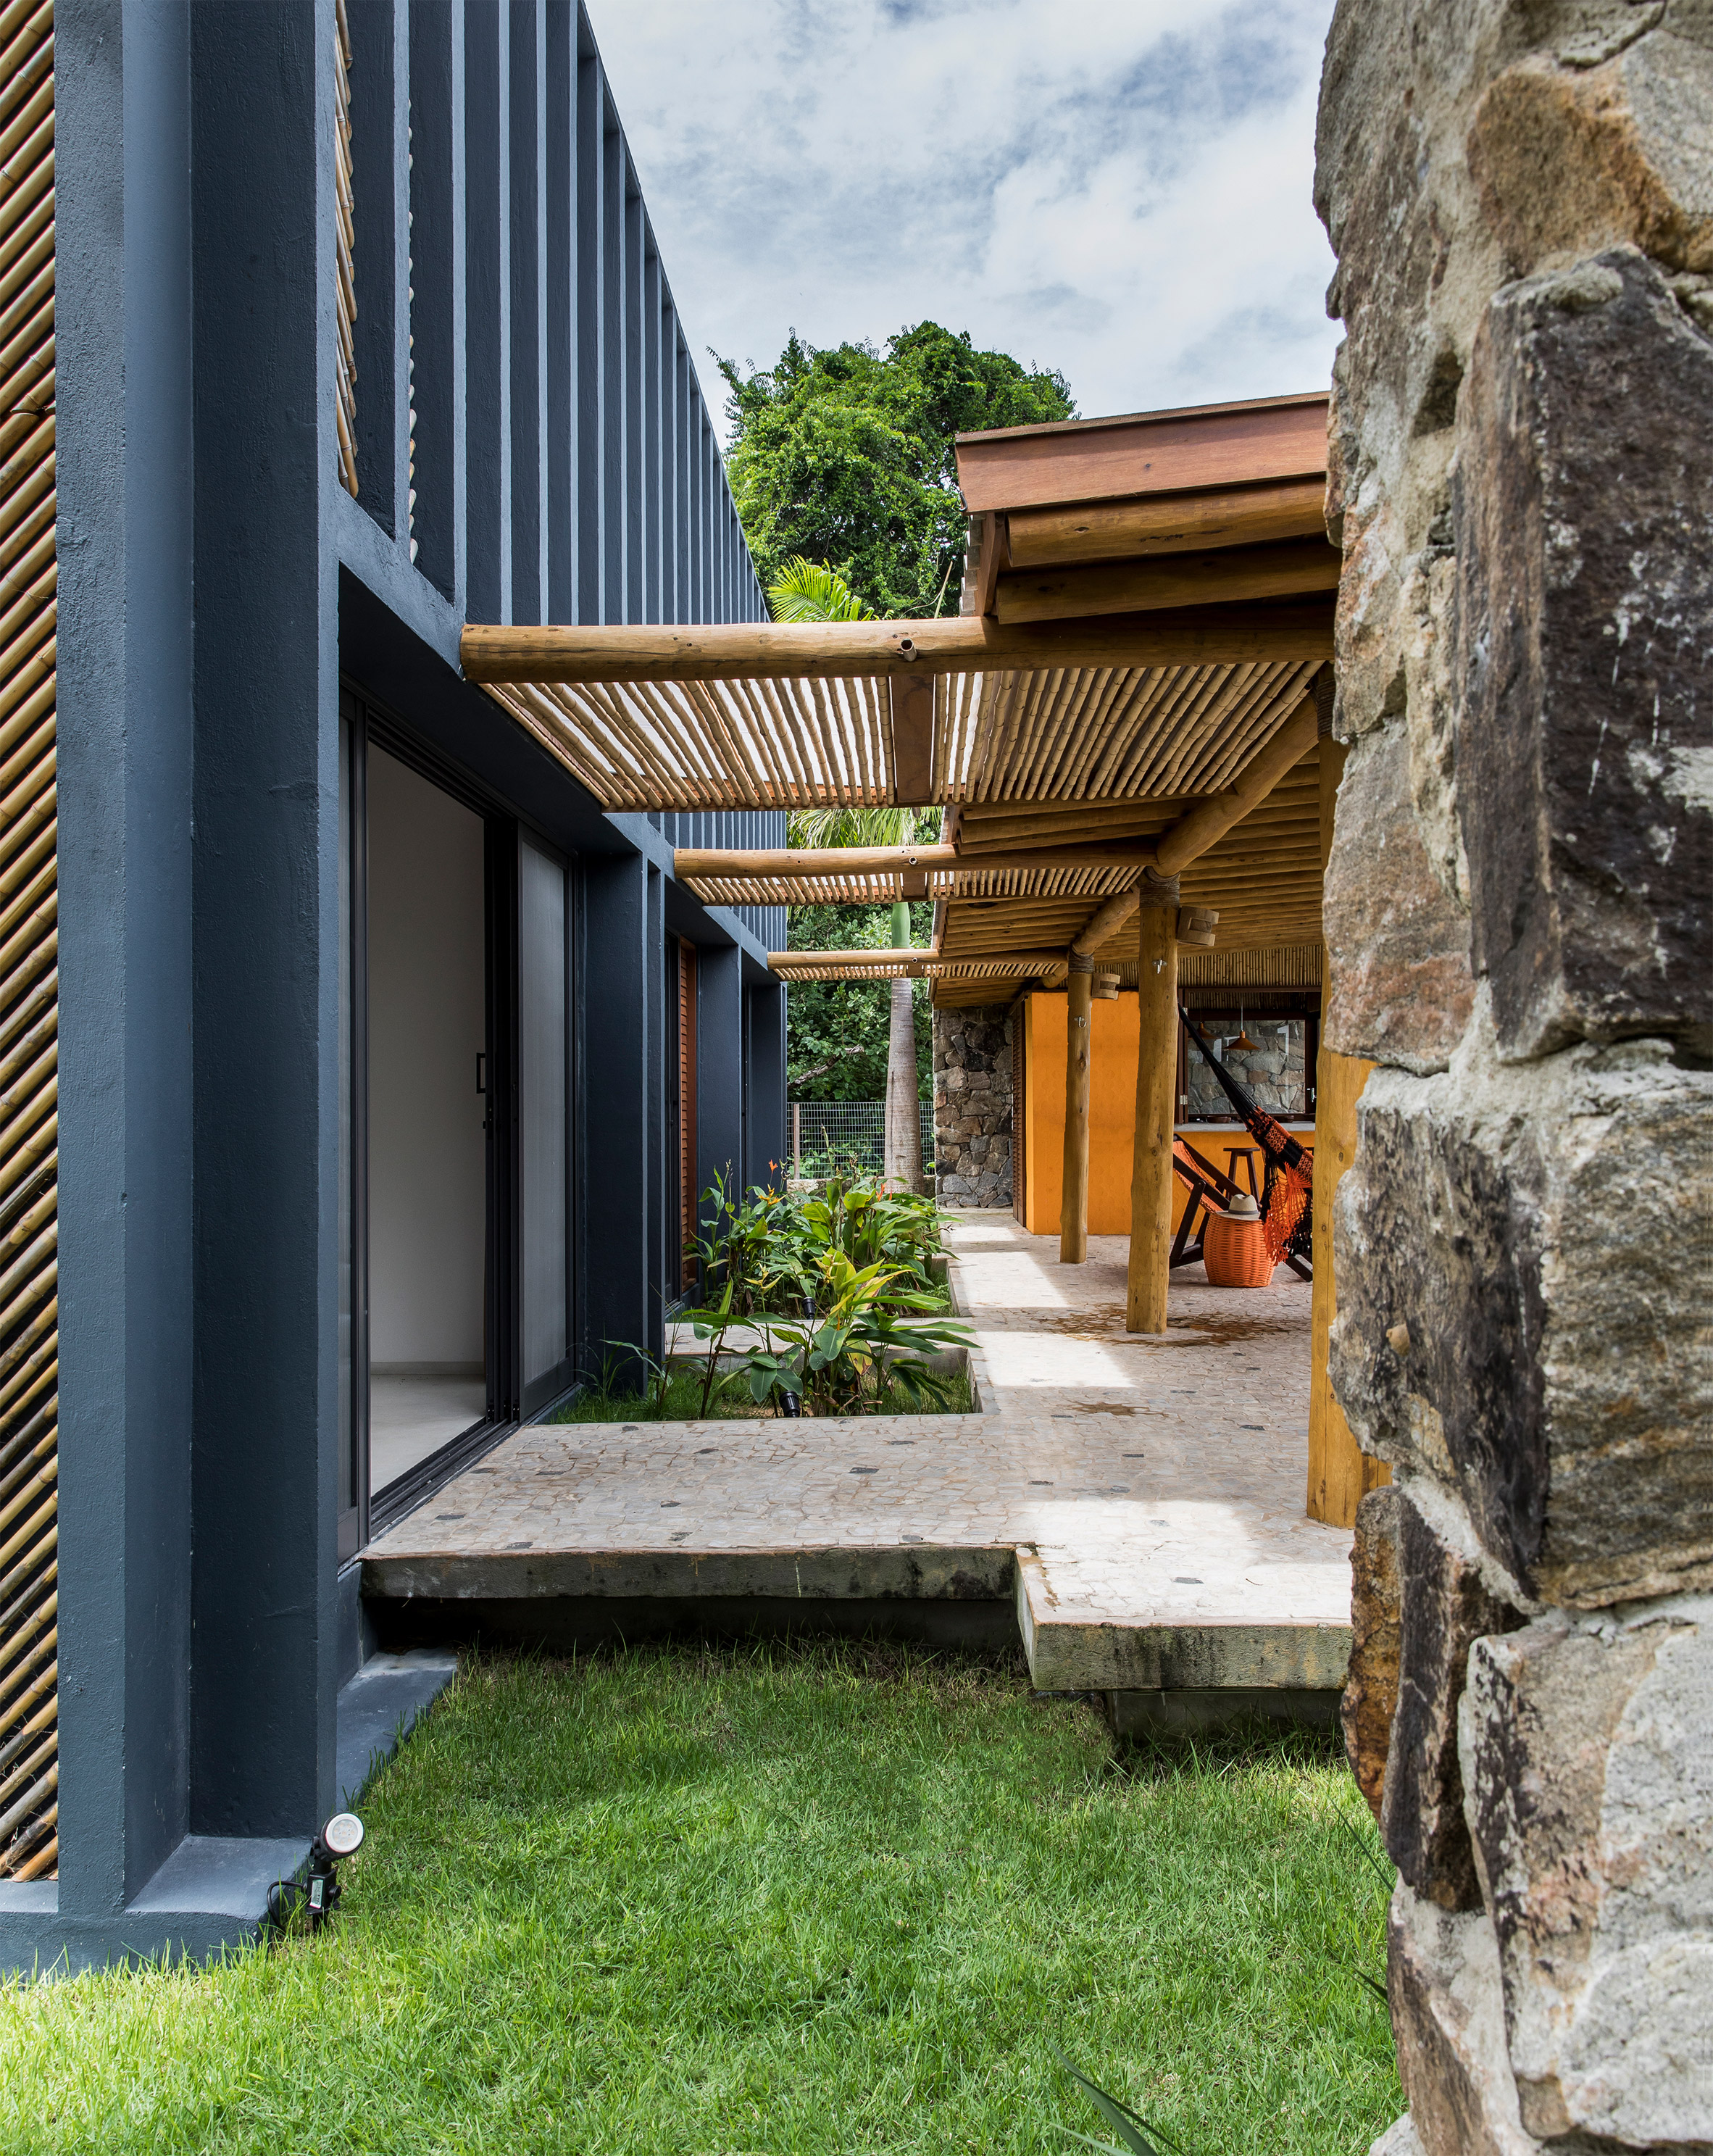 Bamboo House Design Ideas: Vilela Florez Designs Bamboo House With Herringbone